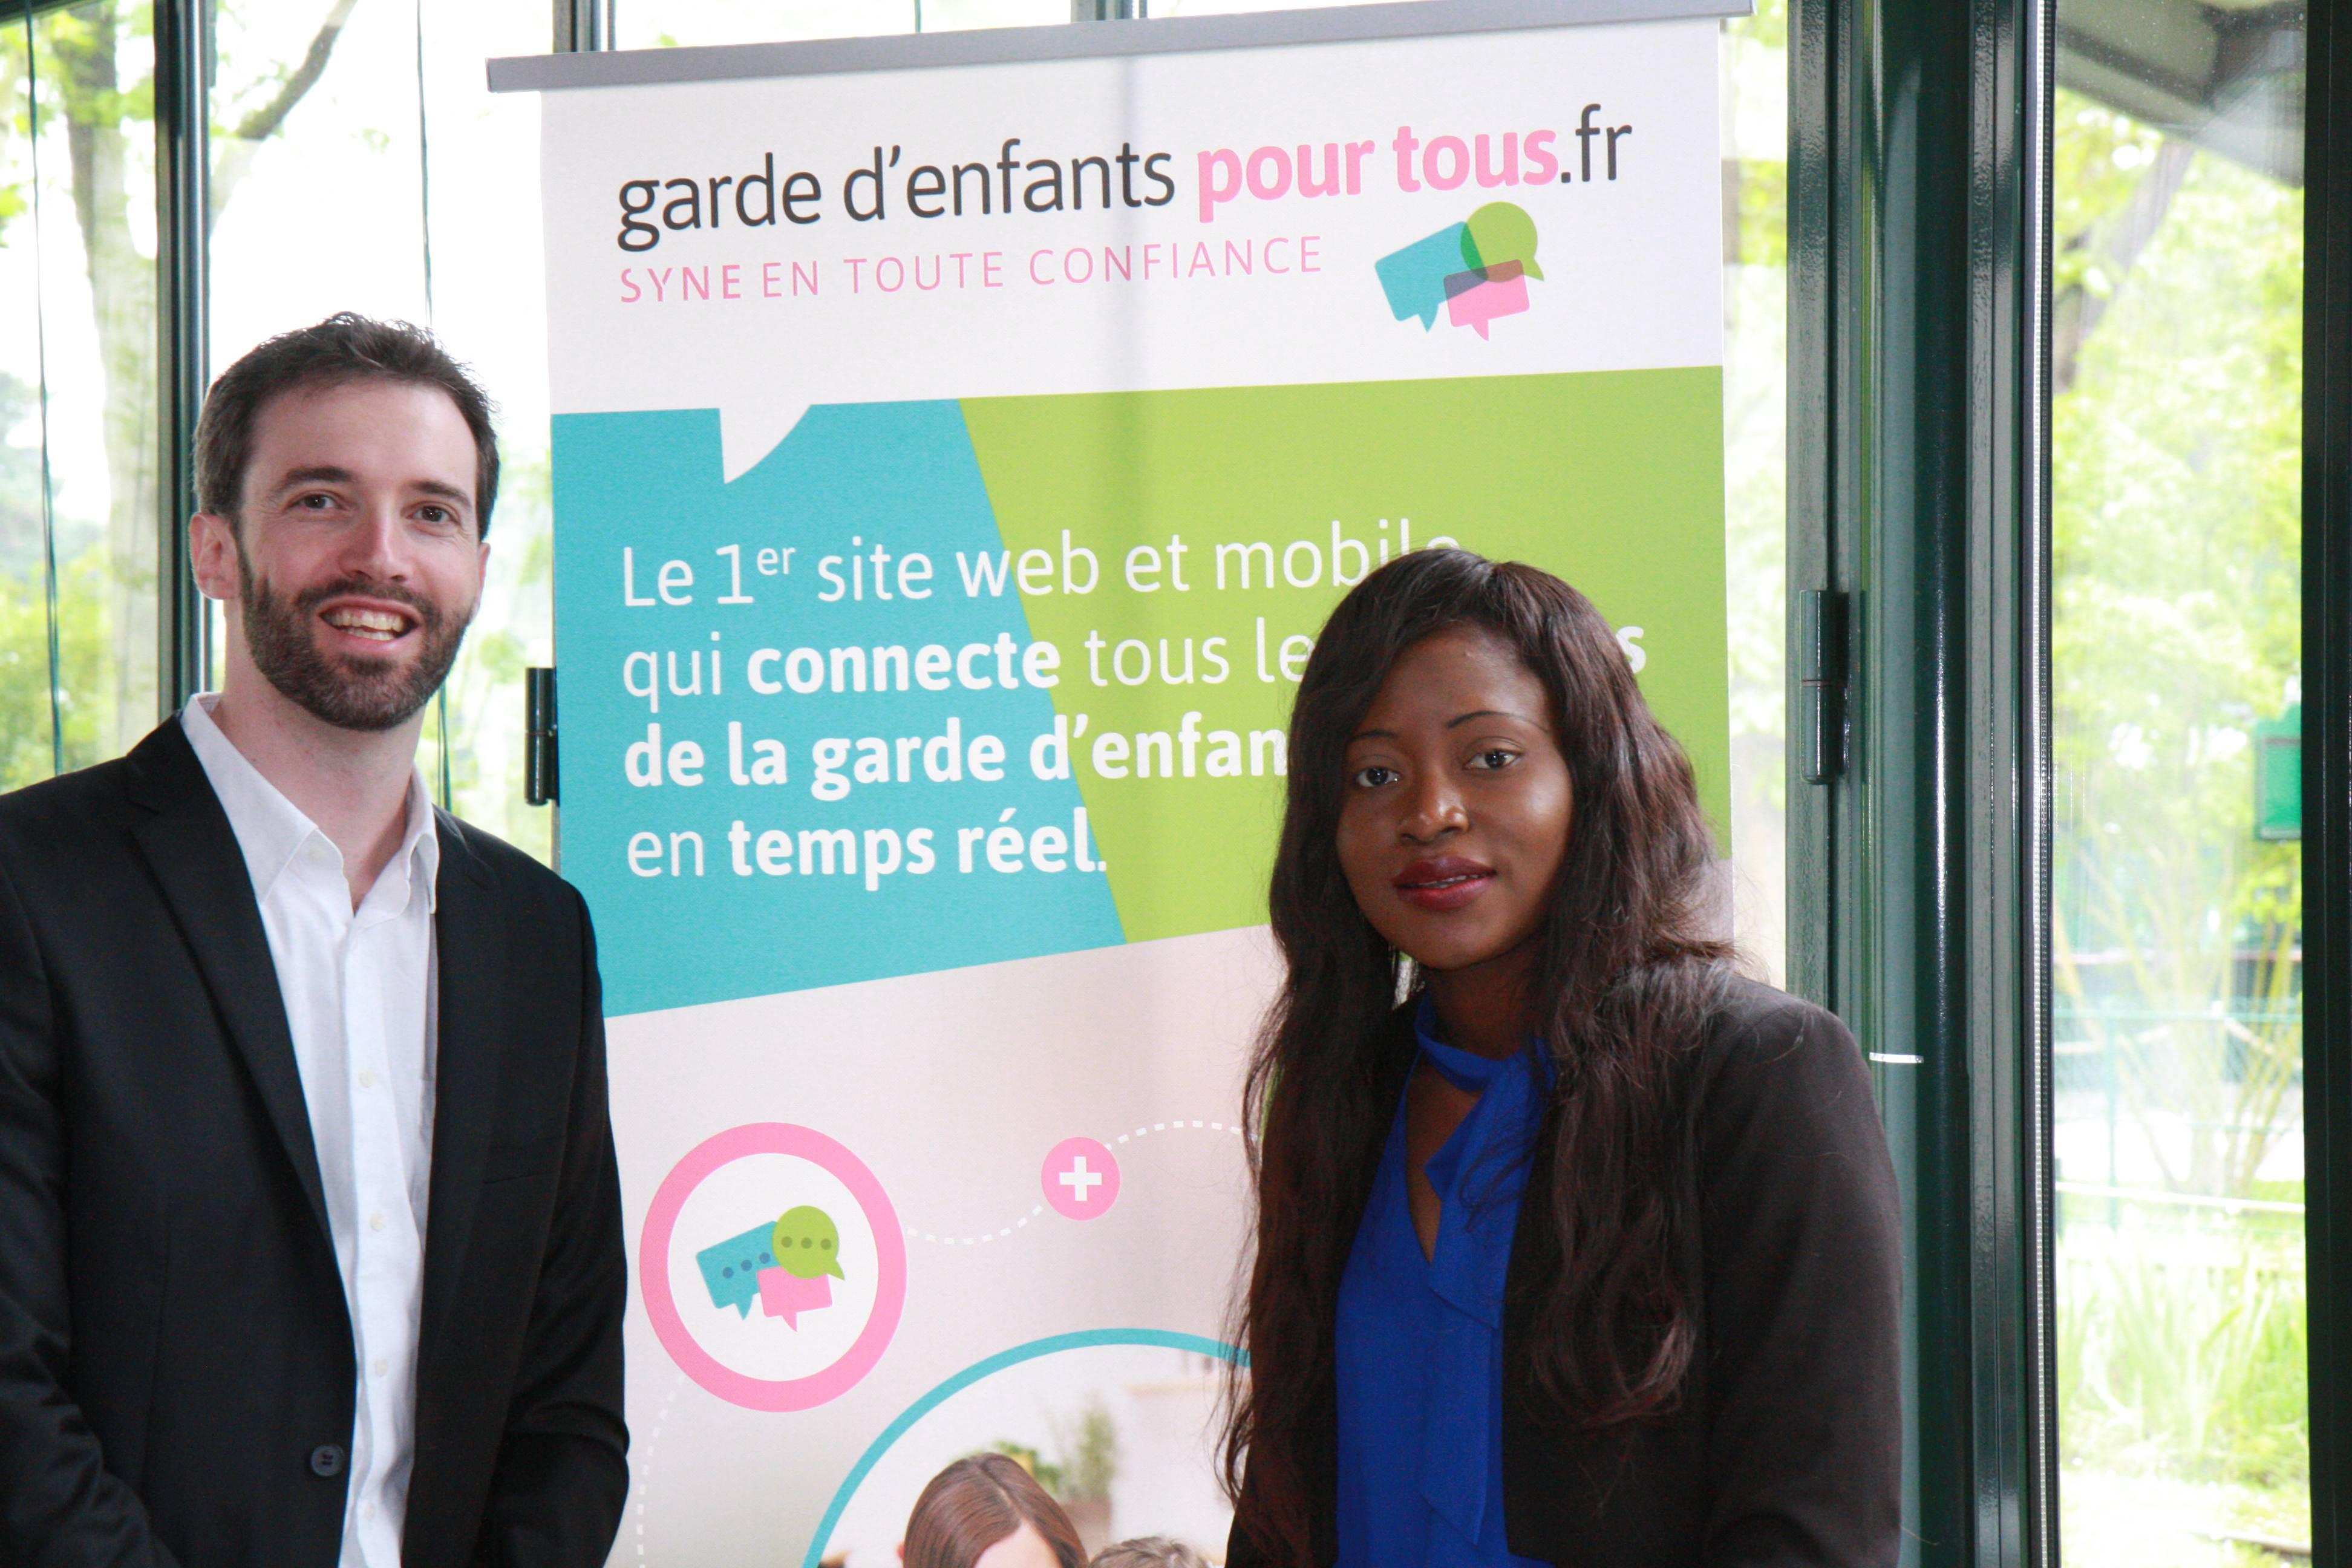 Olivier Jubin et Maryse Degboe de Garde d